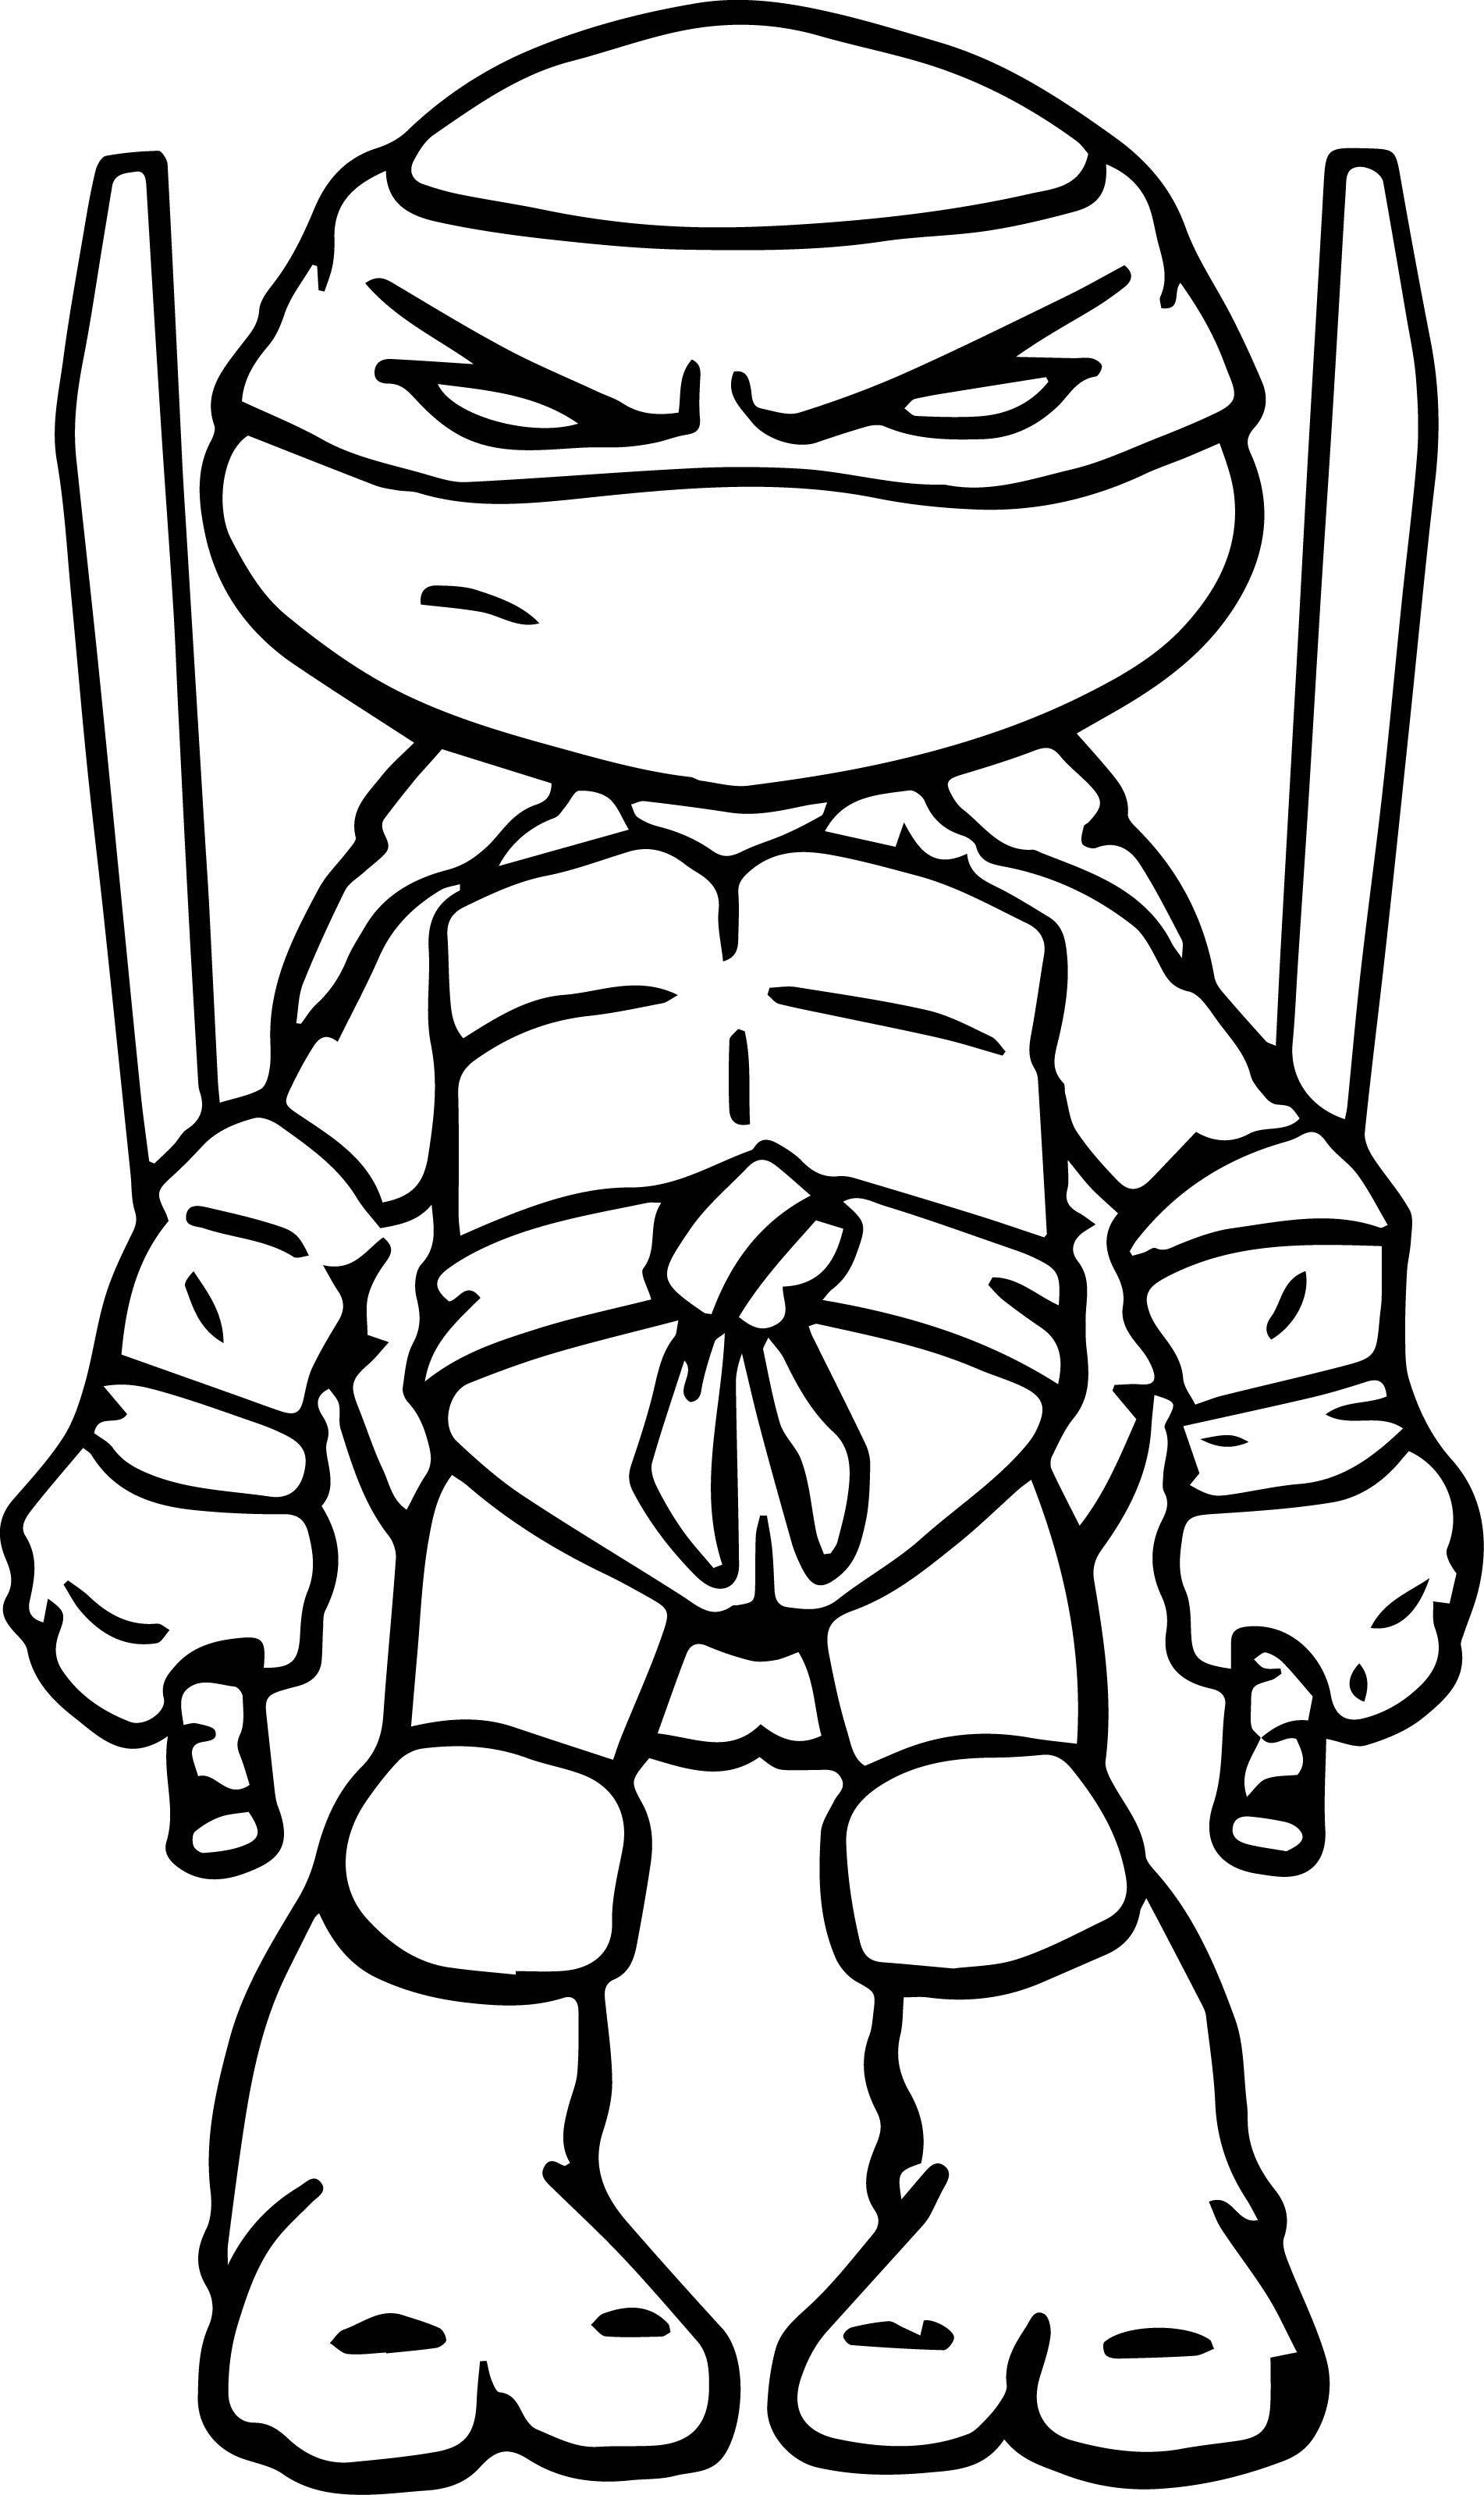 Easy Leonardo Ninja Turtle Drawing Drawing Ideas Collection